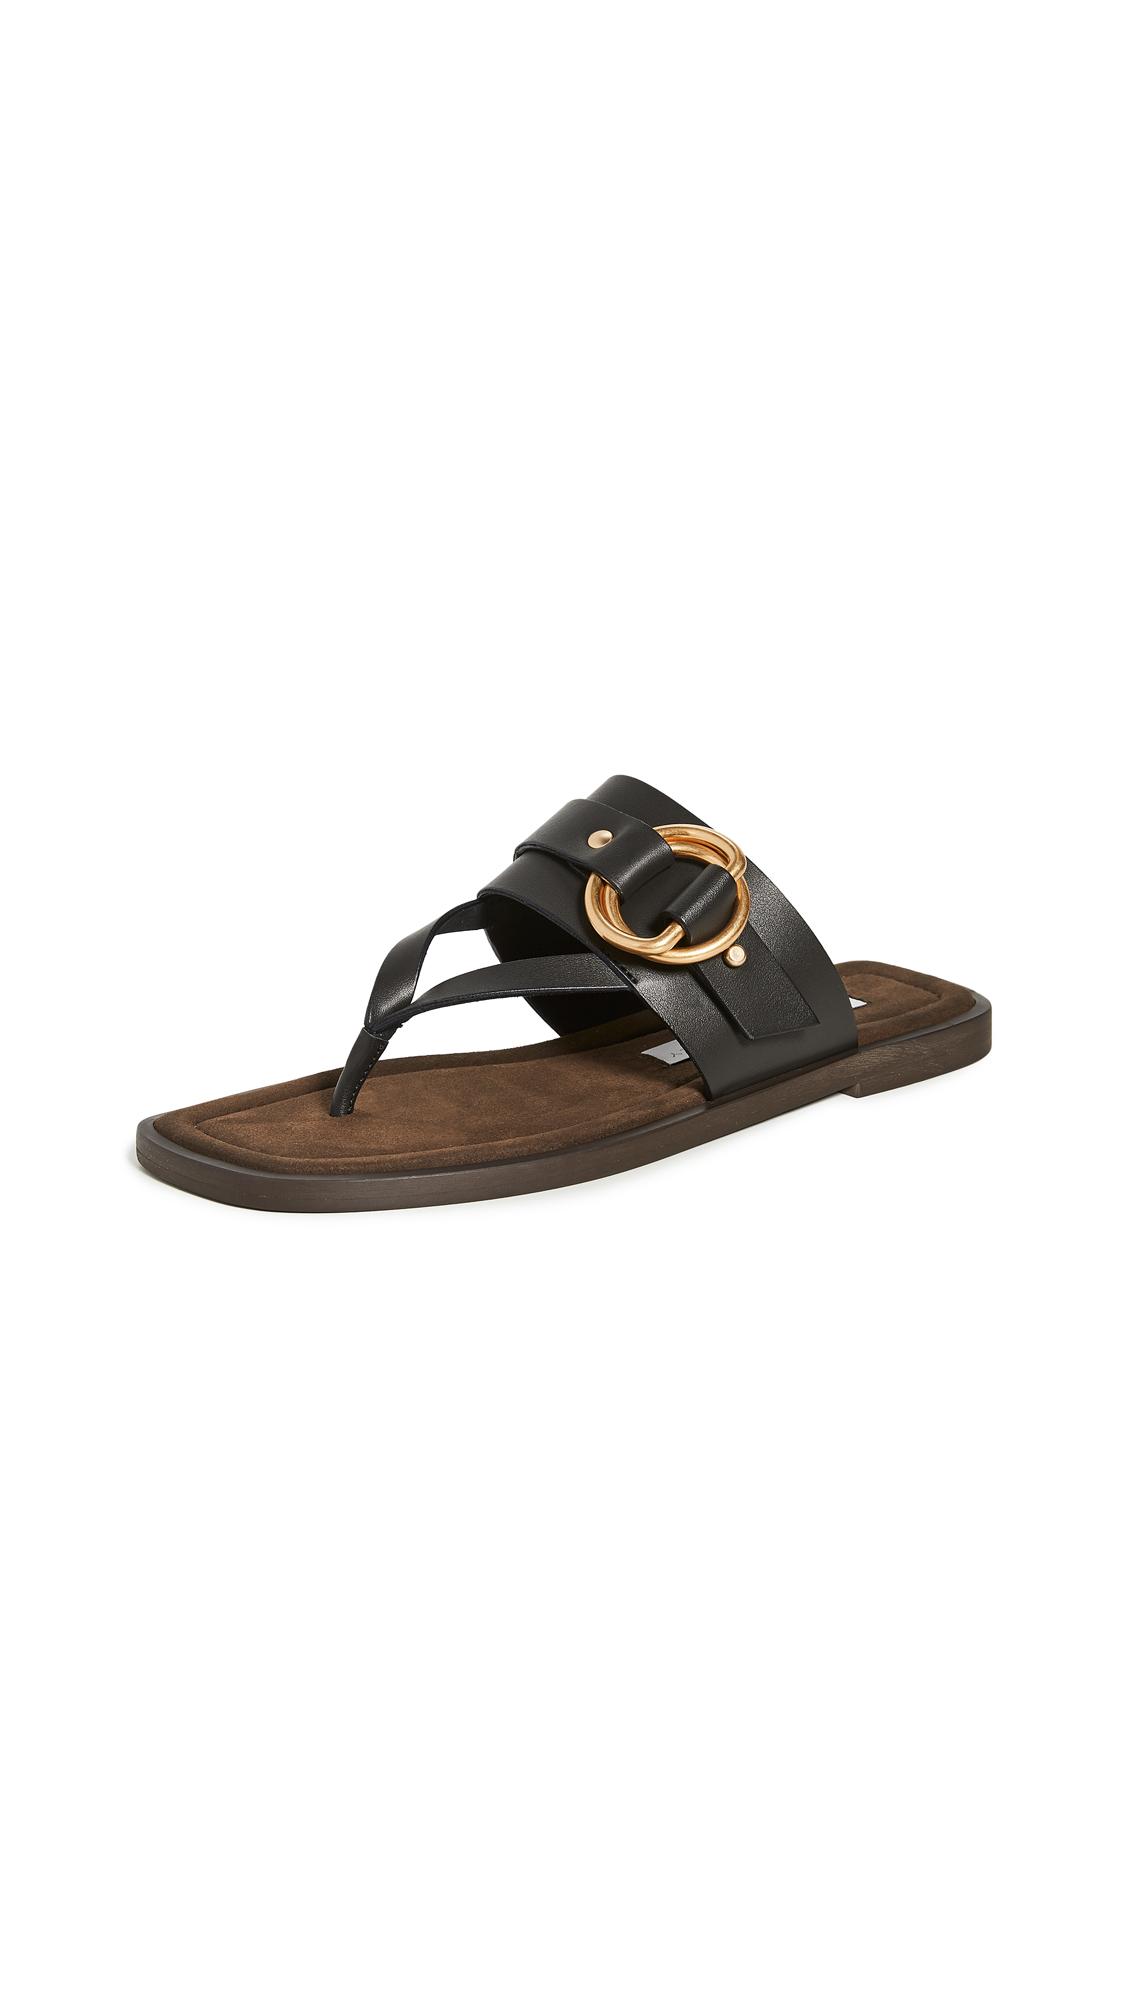 Stella McCartney Thong Sandals - 40% Off Sale